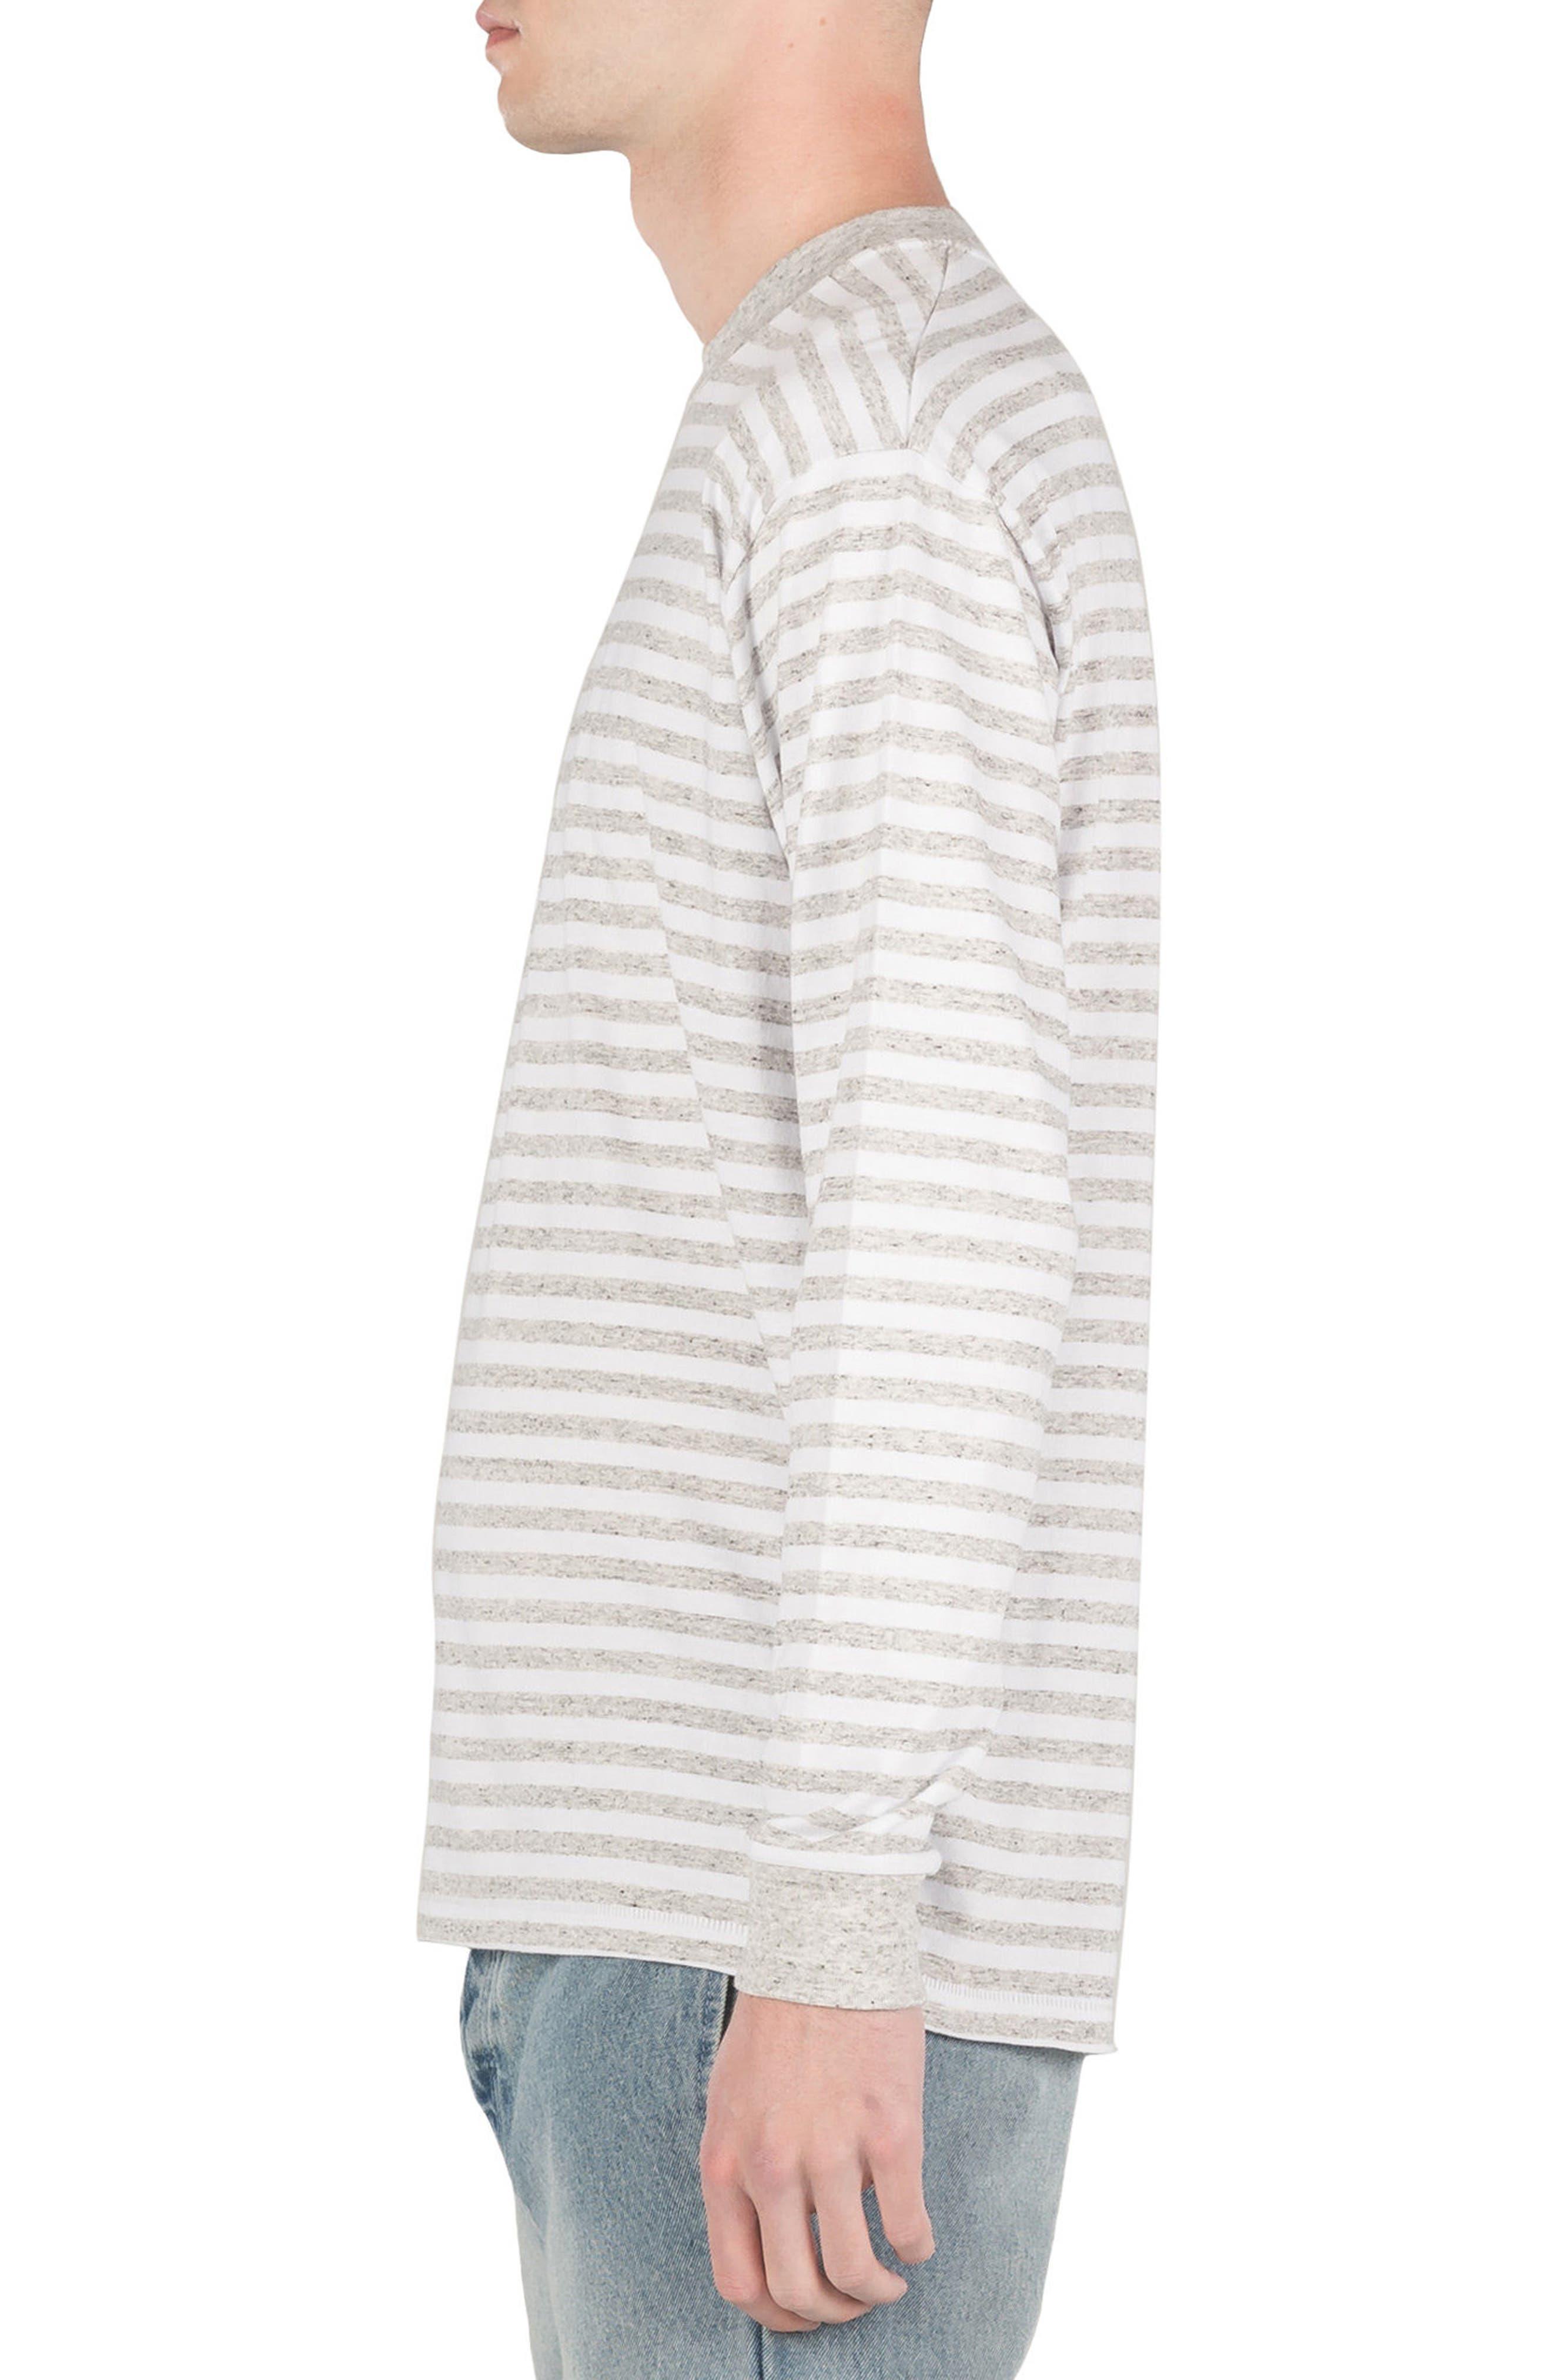 Box Long Sleeve T-Shirt,                             Alternate thumbnail 3, color,                             White/ Storm Marle